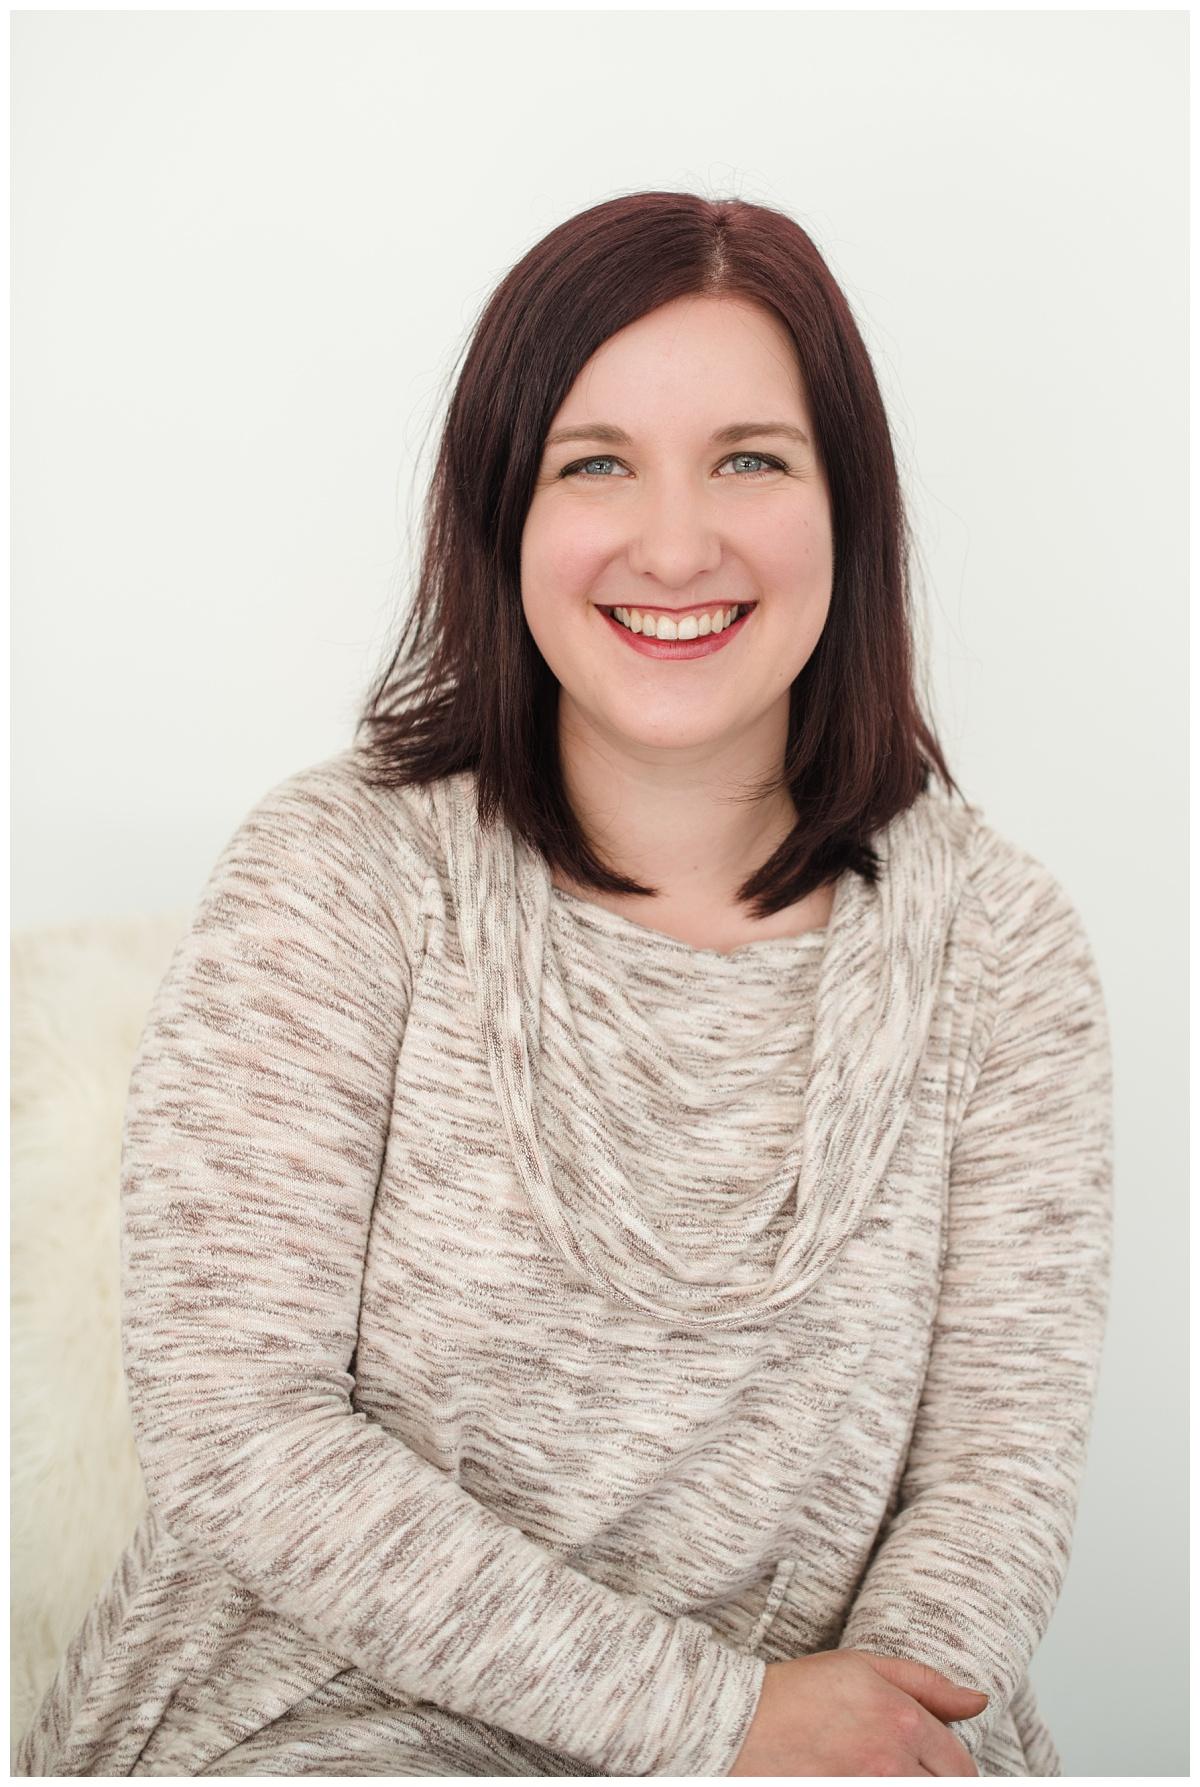 Felicia Kohlhagen | Sr. Lead Florist